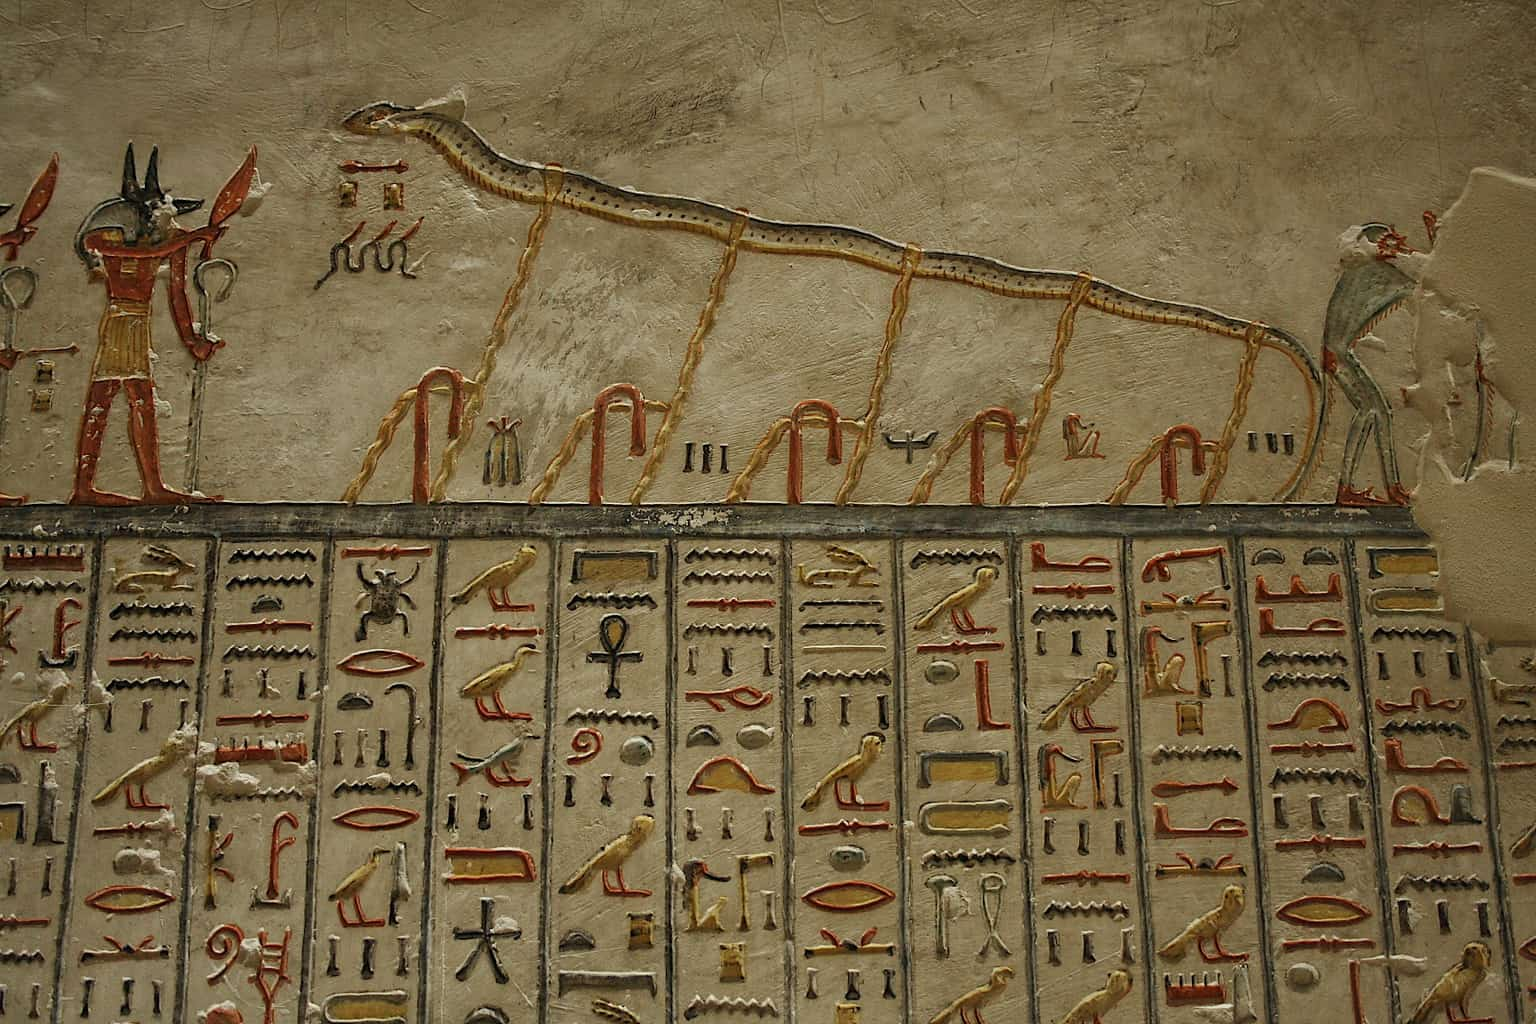 kv9-apep-bound-detail-egypt